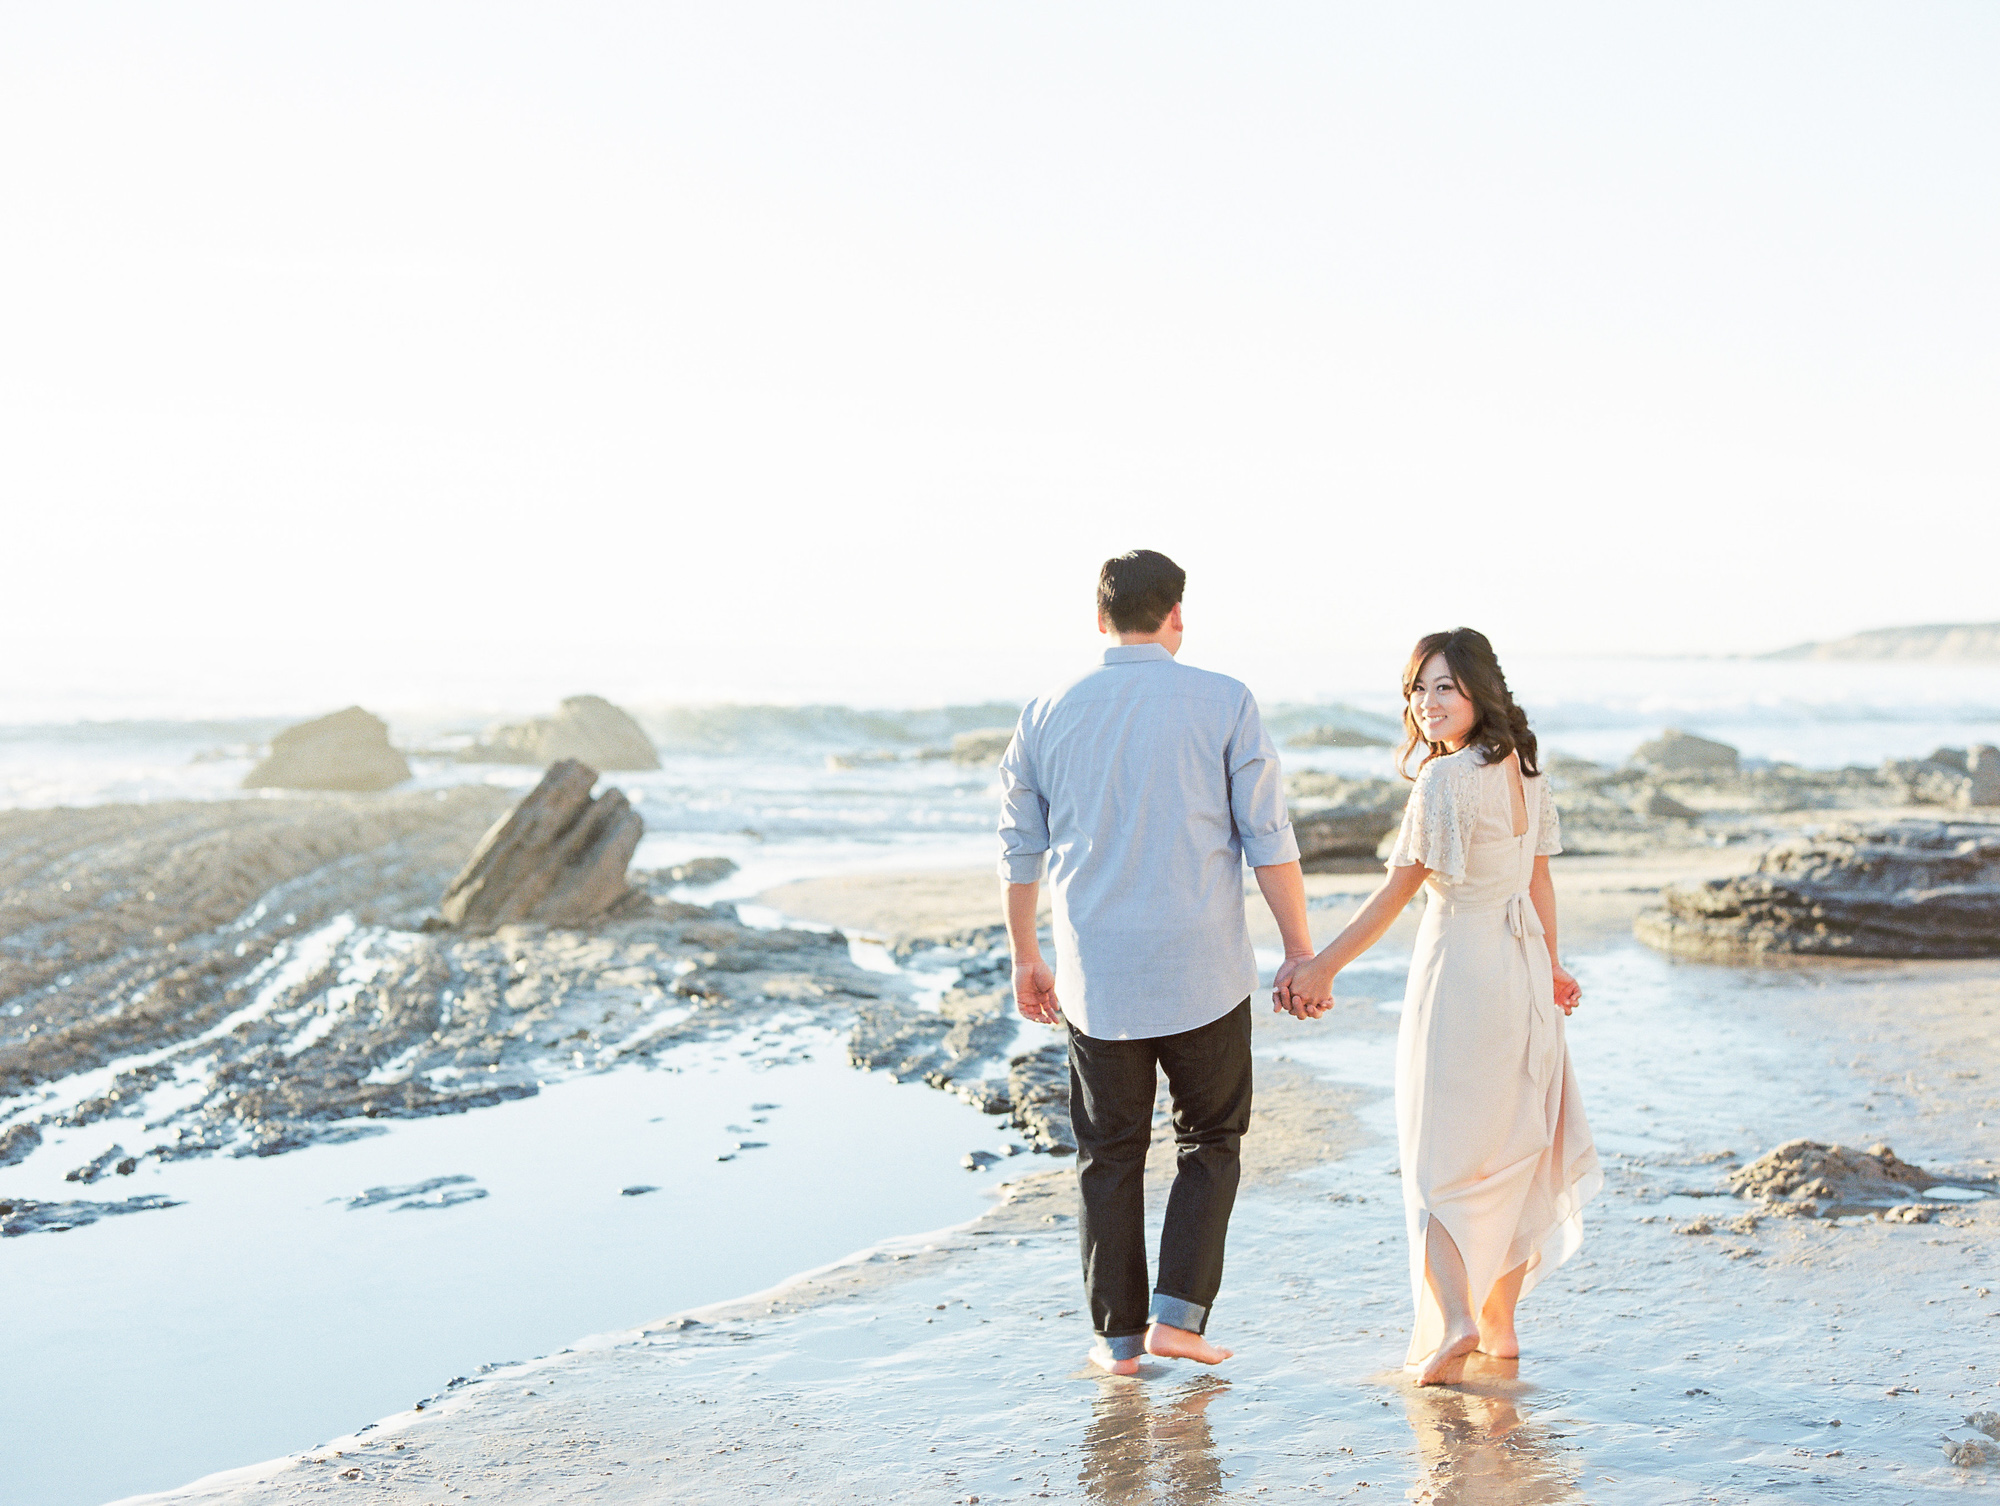 Crystal-Cove-Engagement-Kristina-Adams-1.jpg